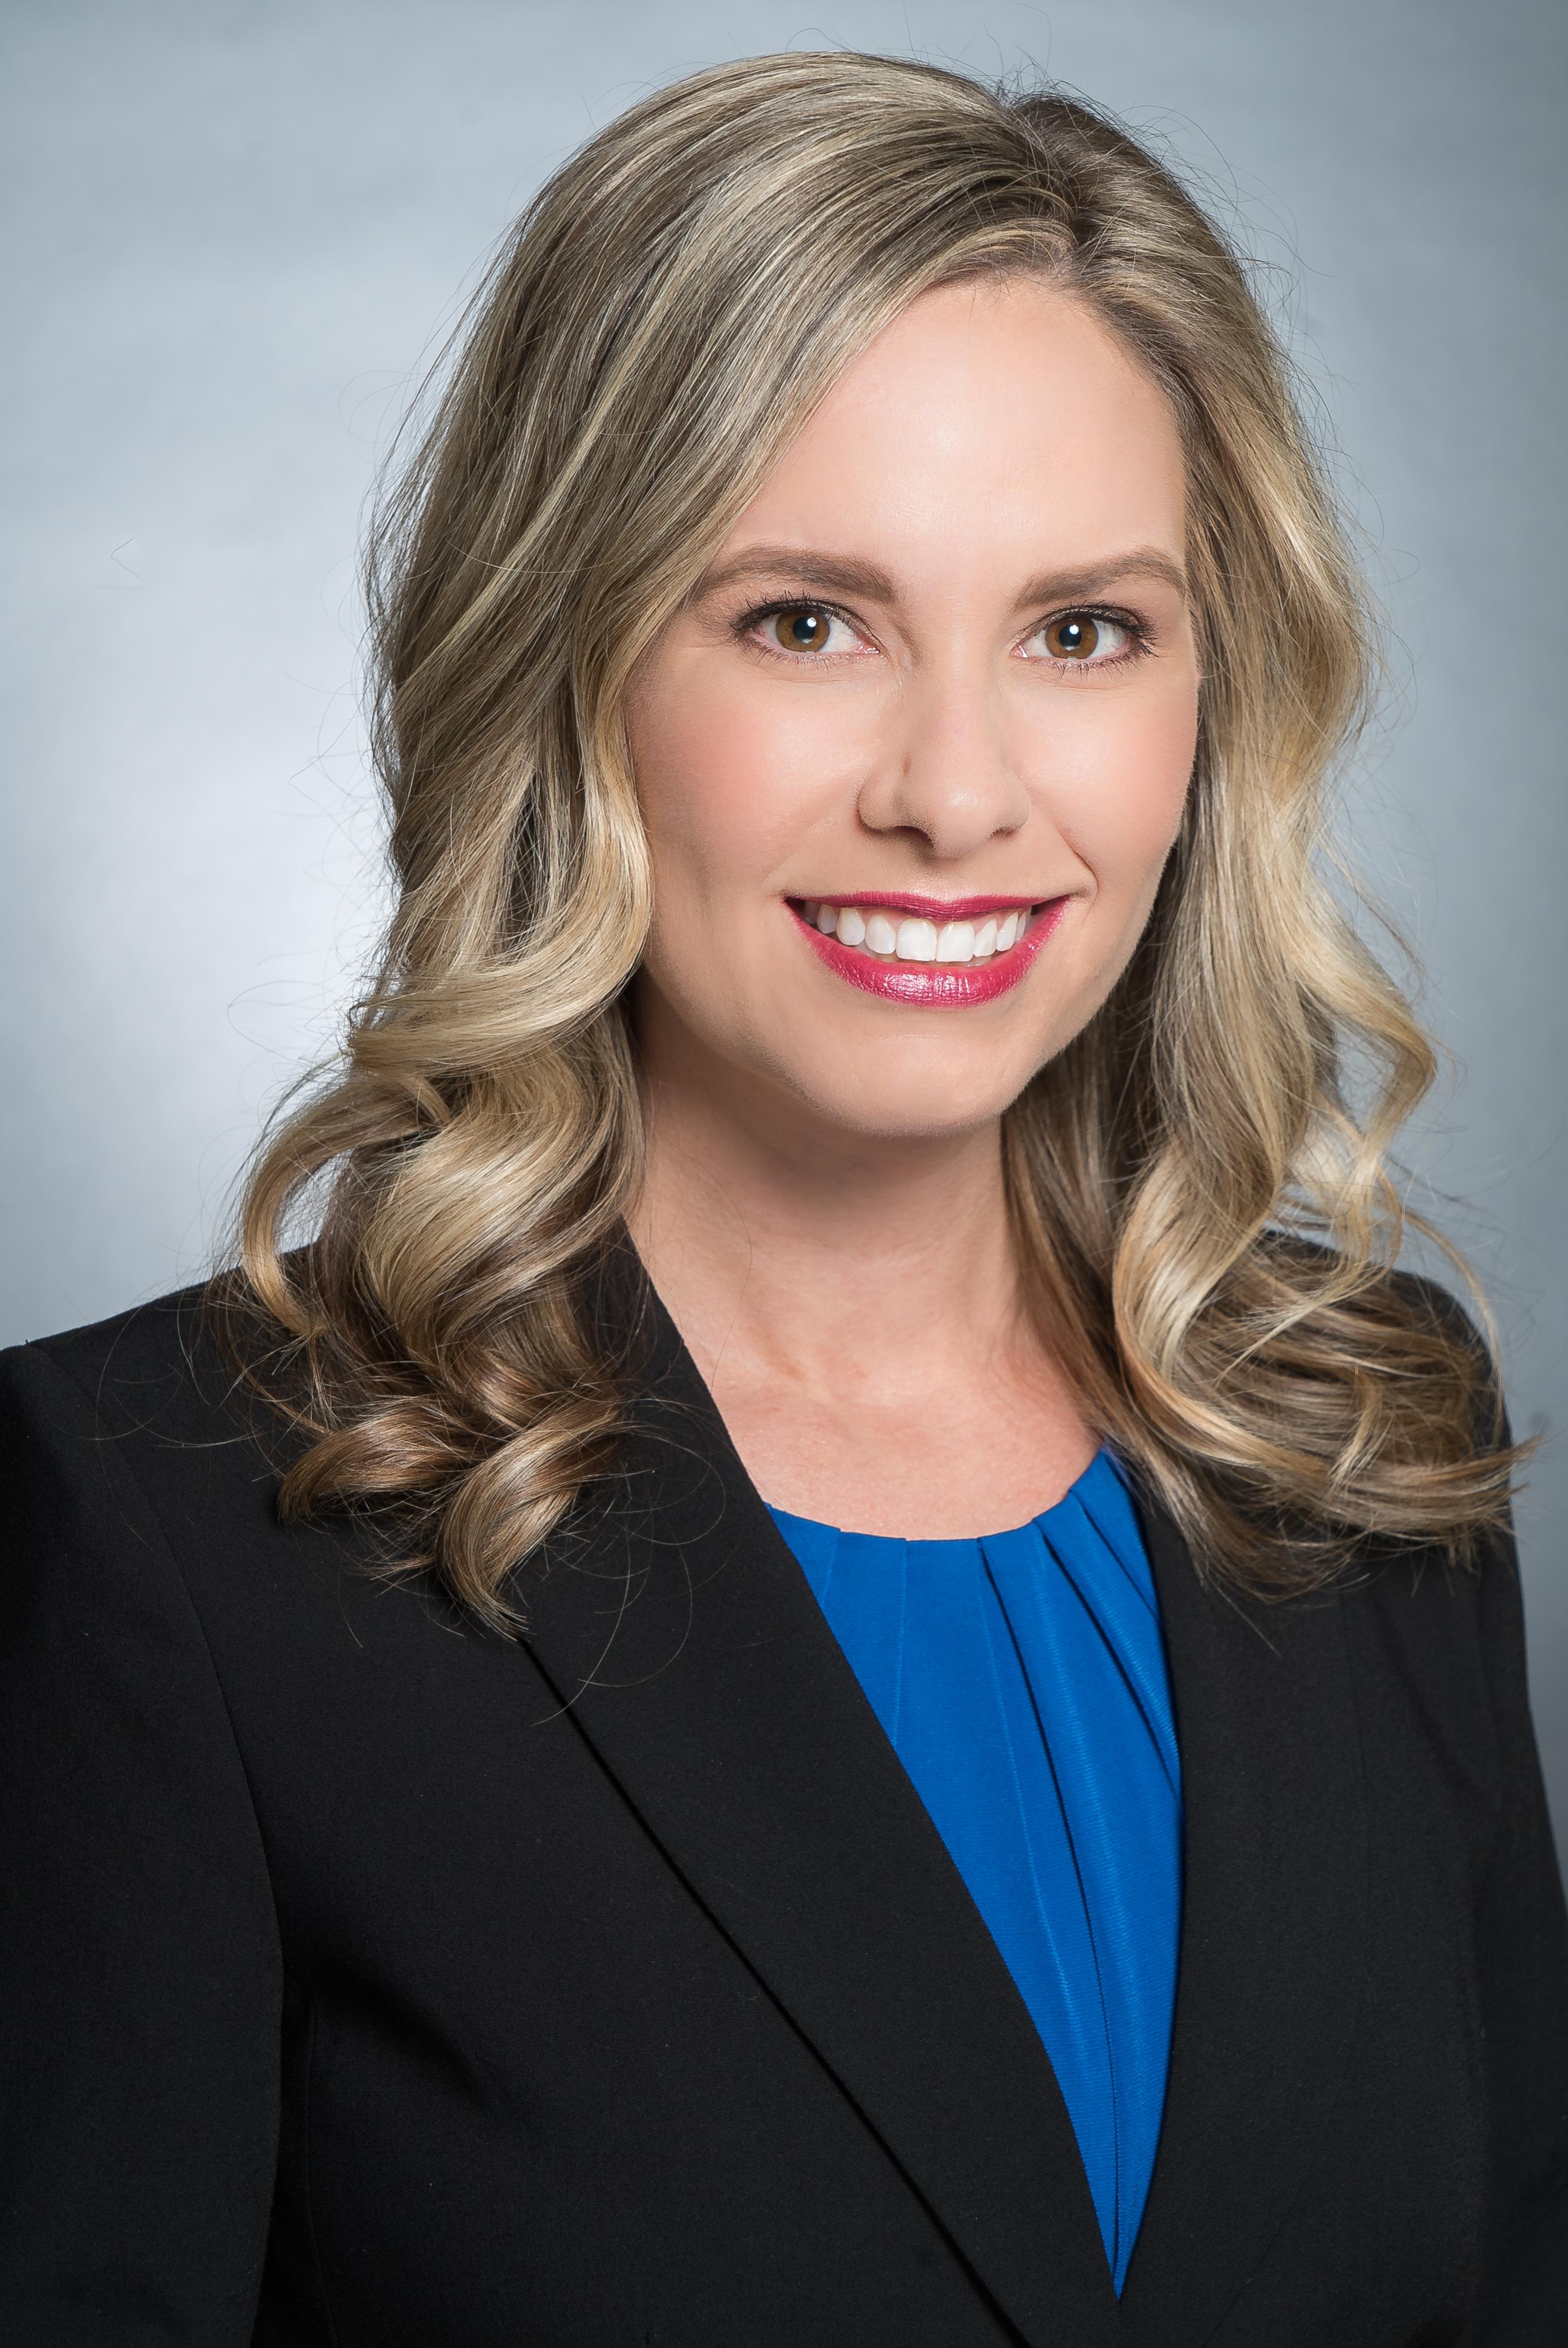 Brooke Marshall - Director of Marketing